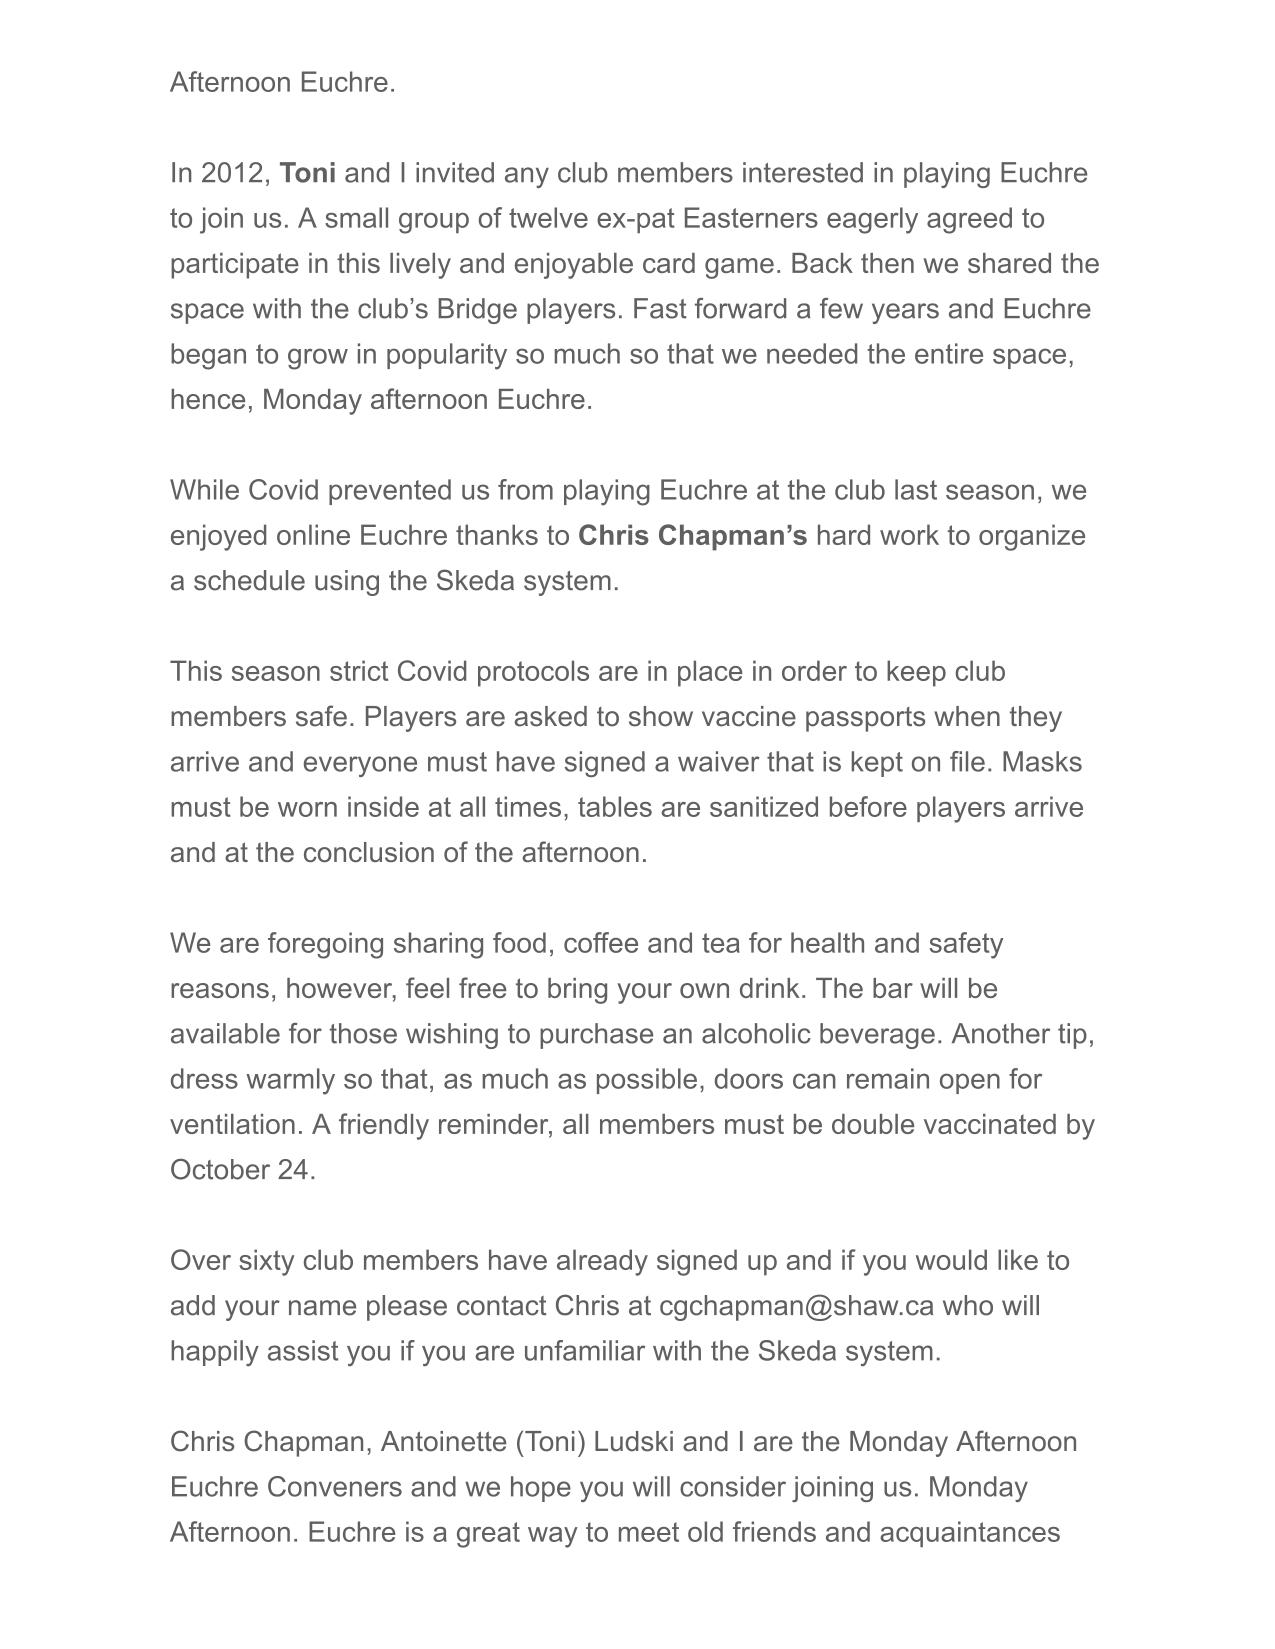 Stanley_Park_Lawn_Bowling_Club_News-4.jpg